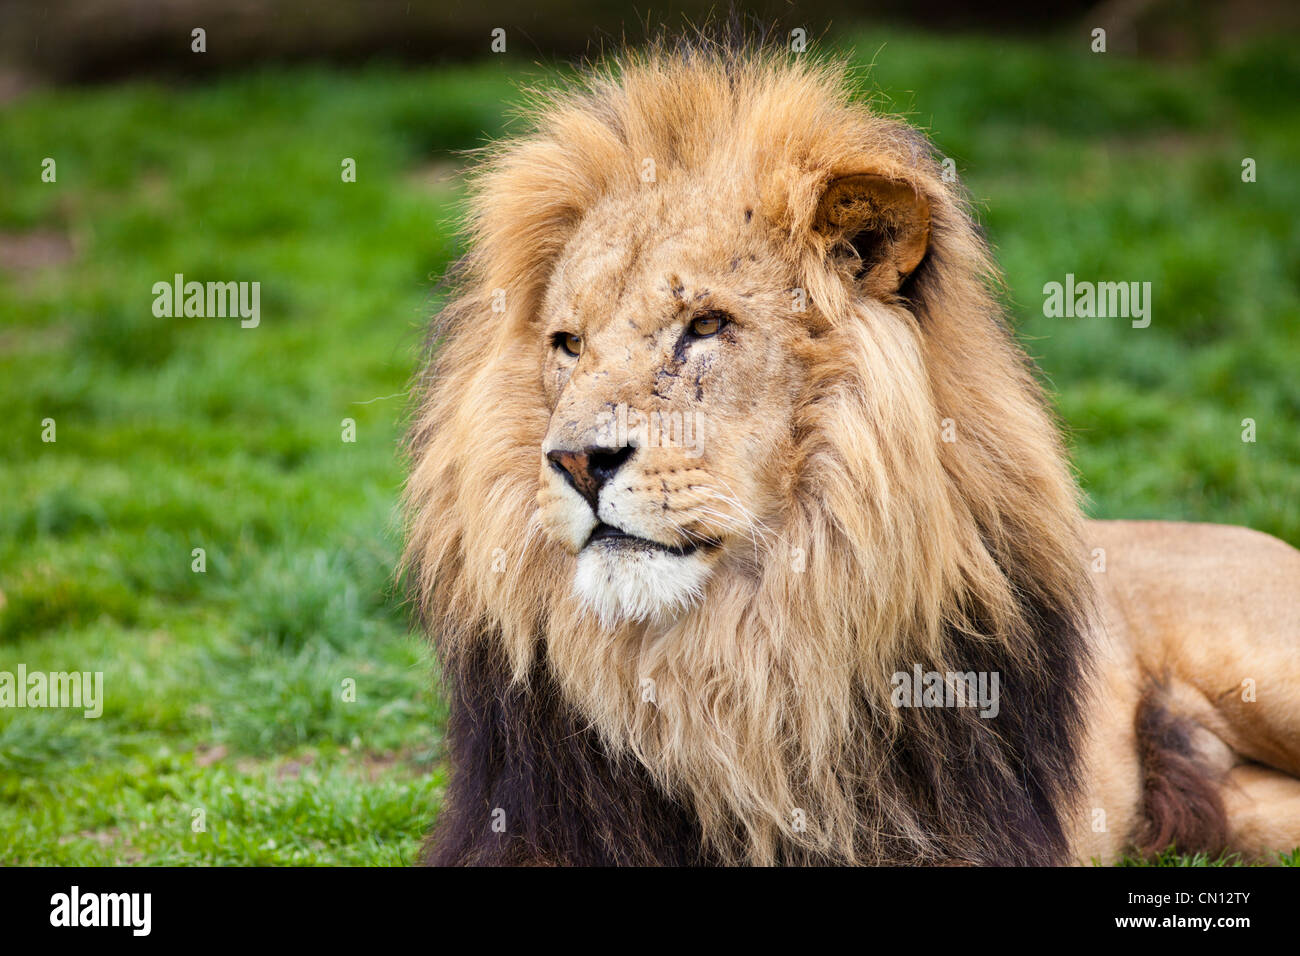 African Lion - Panthera leo - Stock Image